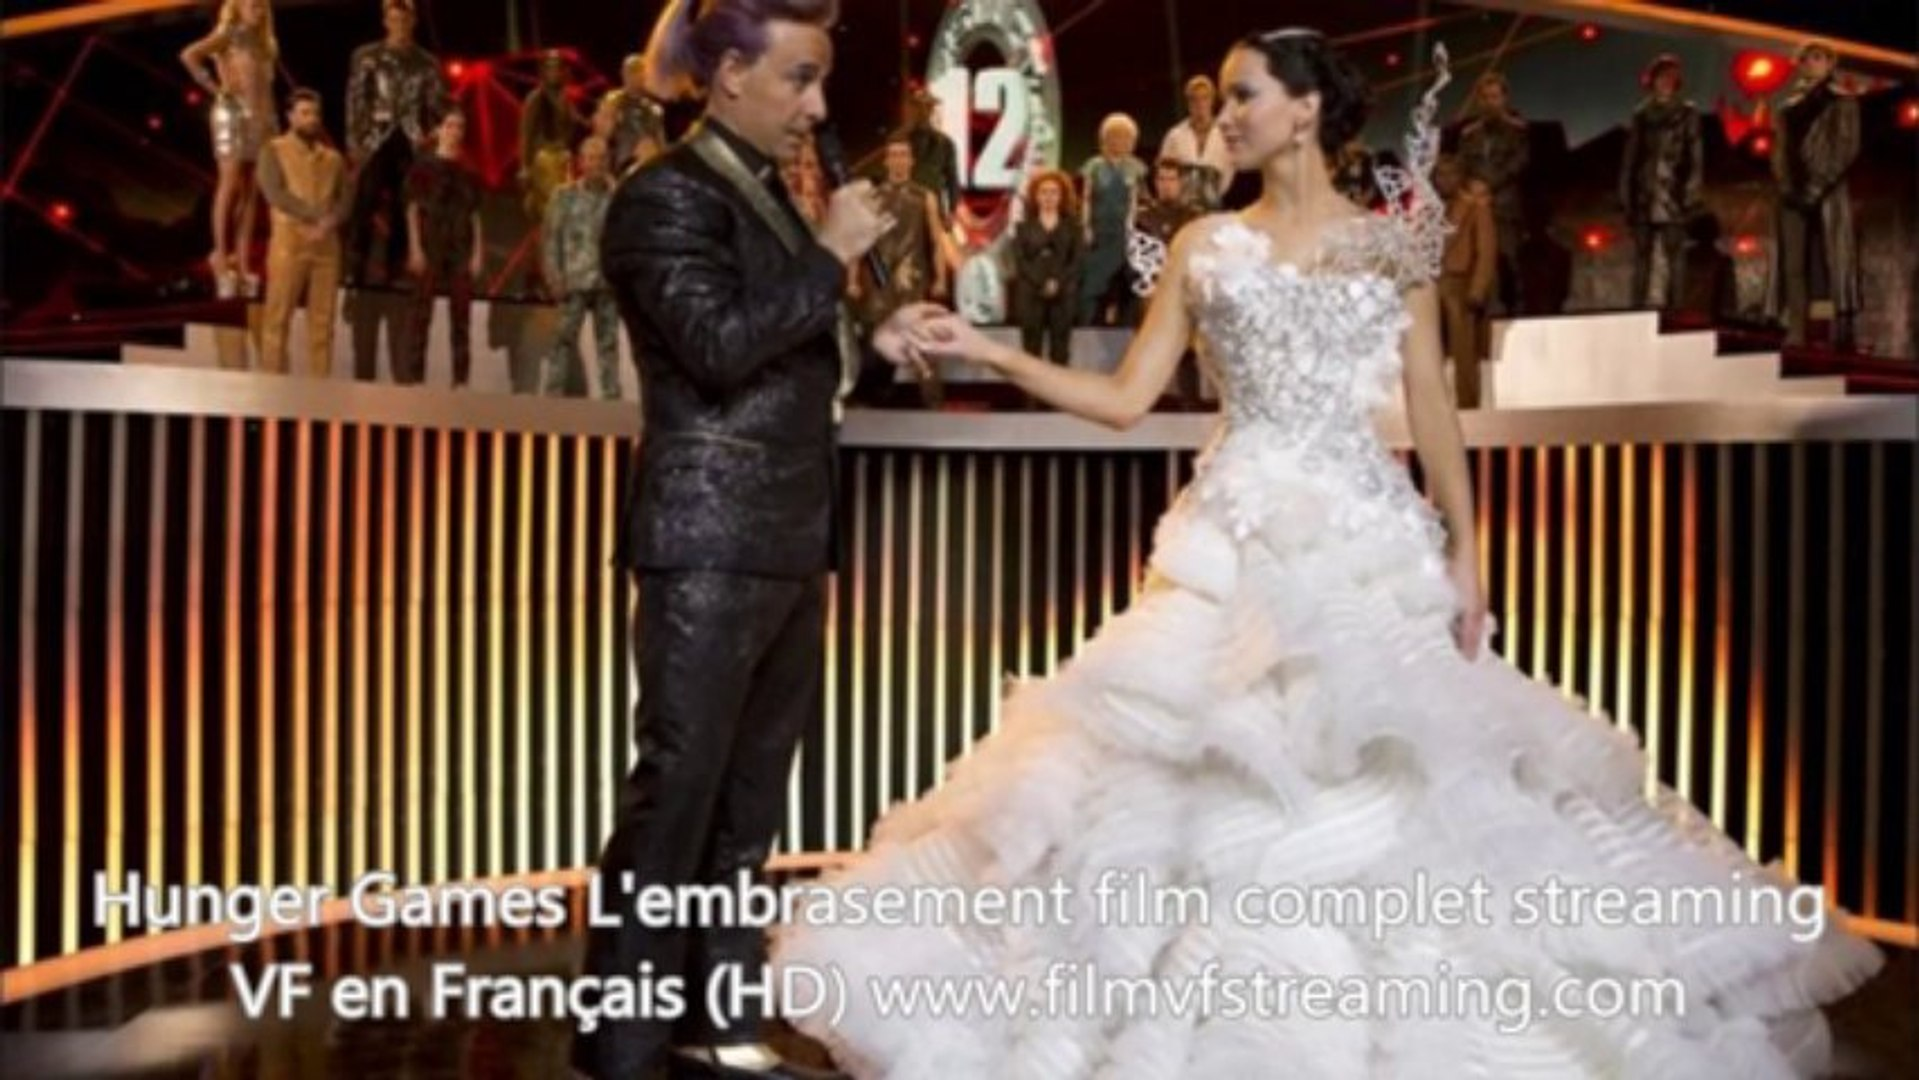 Hunger Games L'embrasement voir film entier en Français online streaming VF entièrement